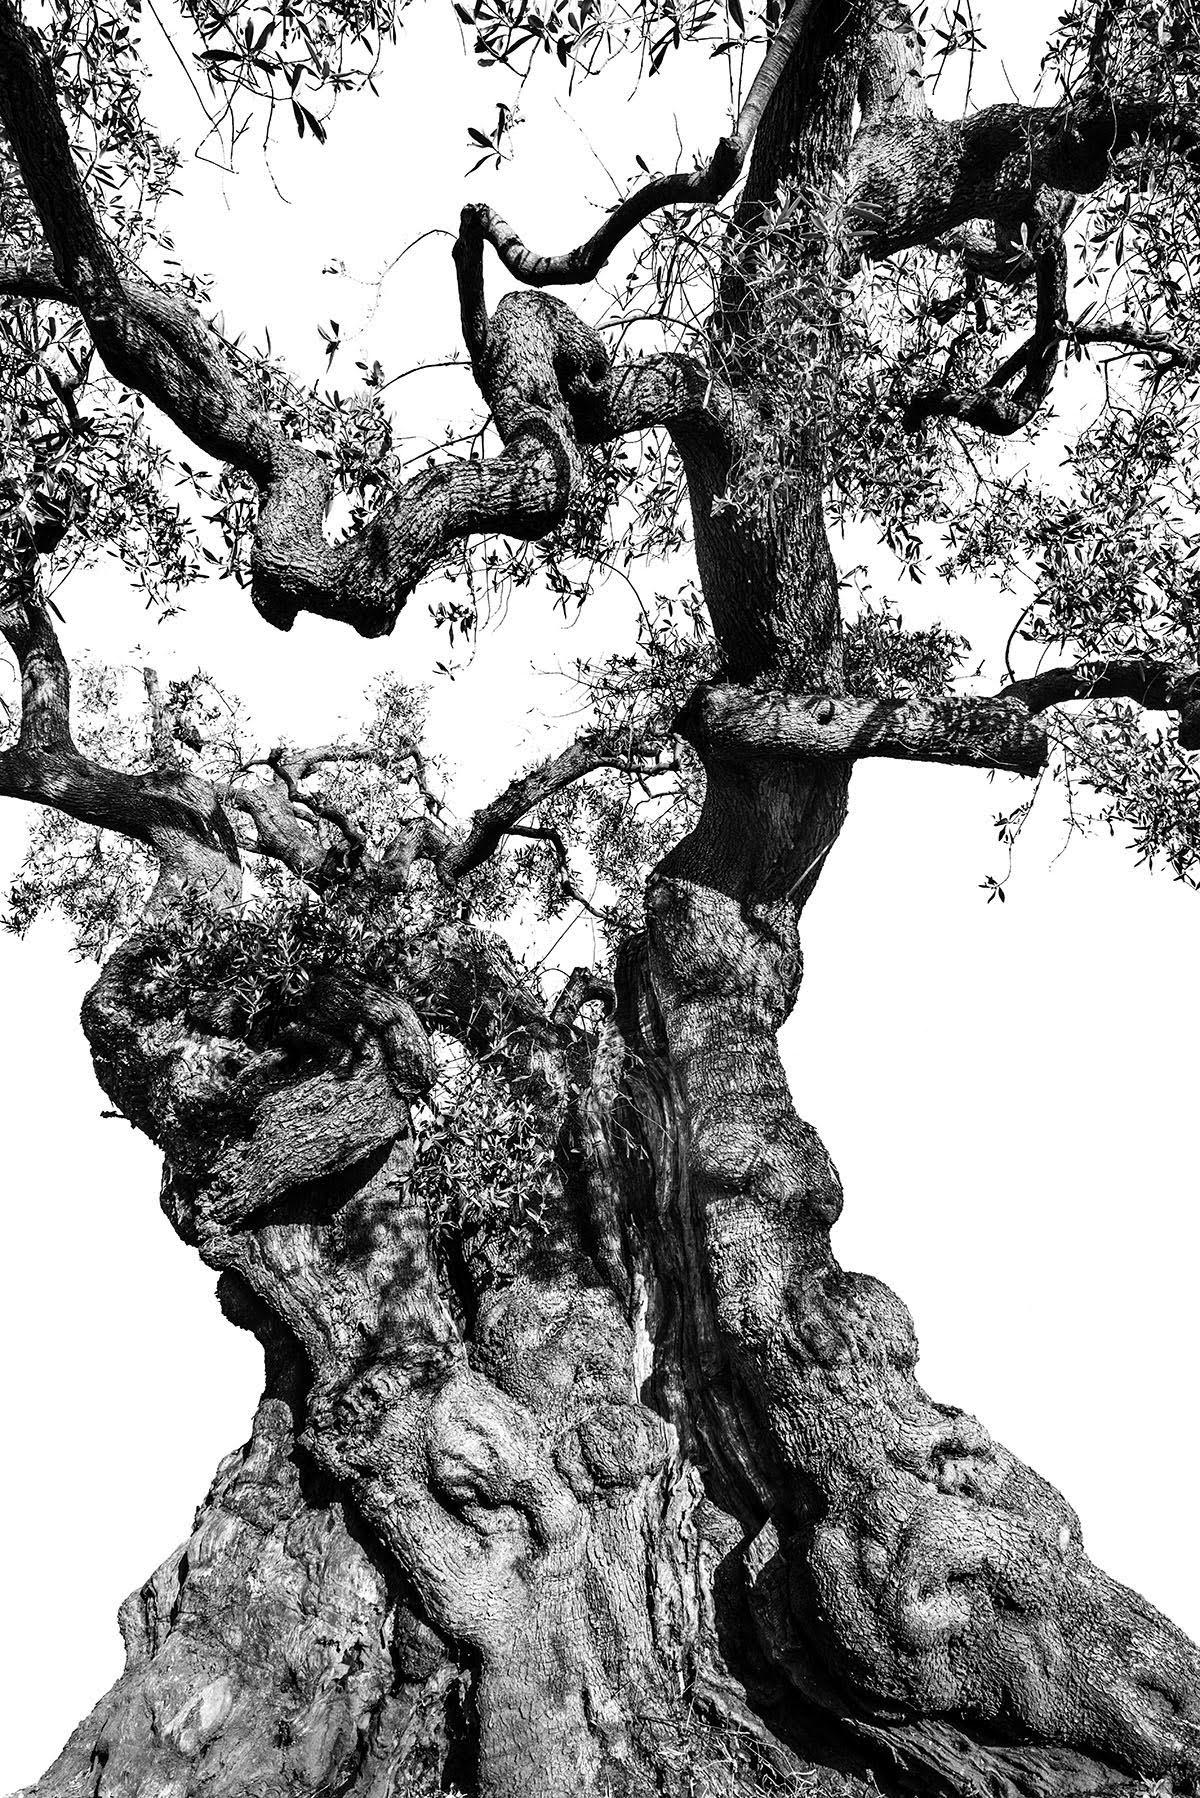 martin-ogolter-Monumentali-nature-landscape-photographer-07